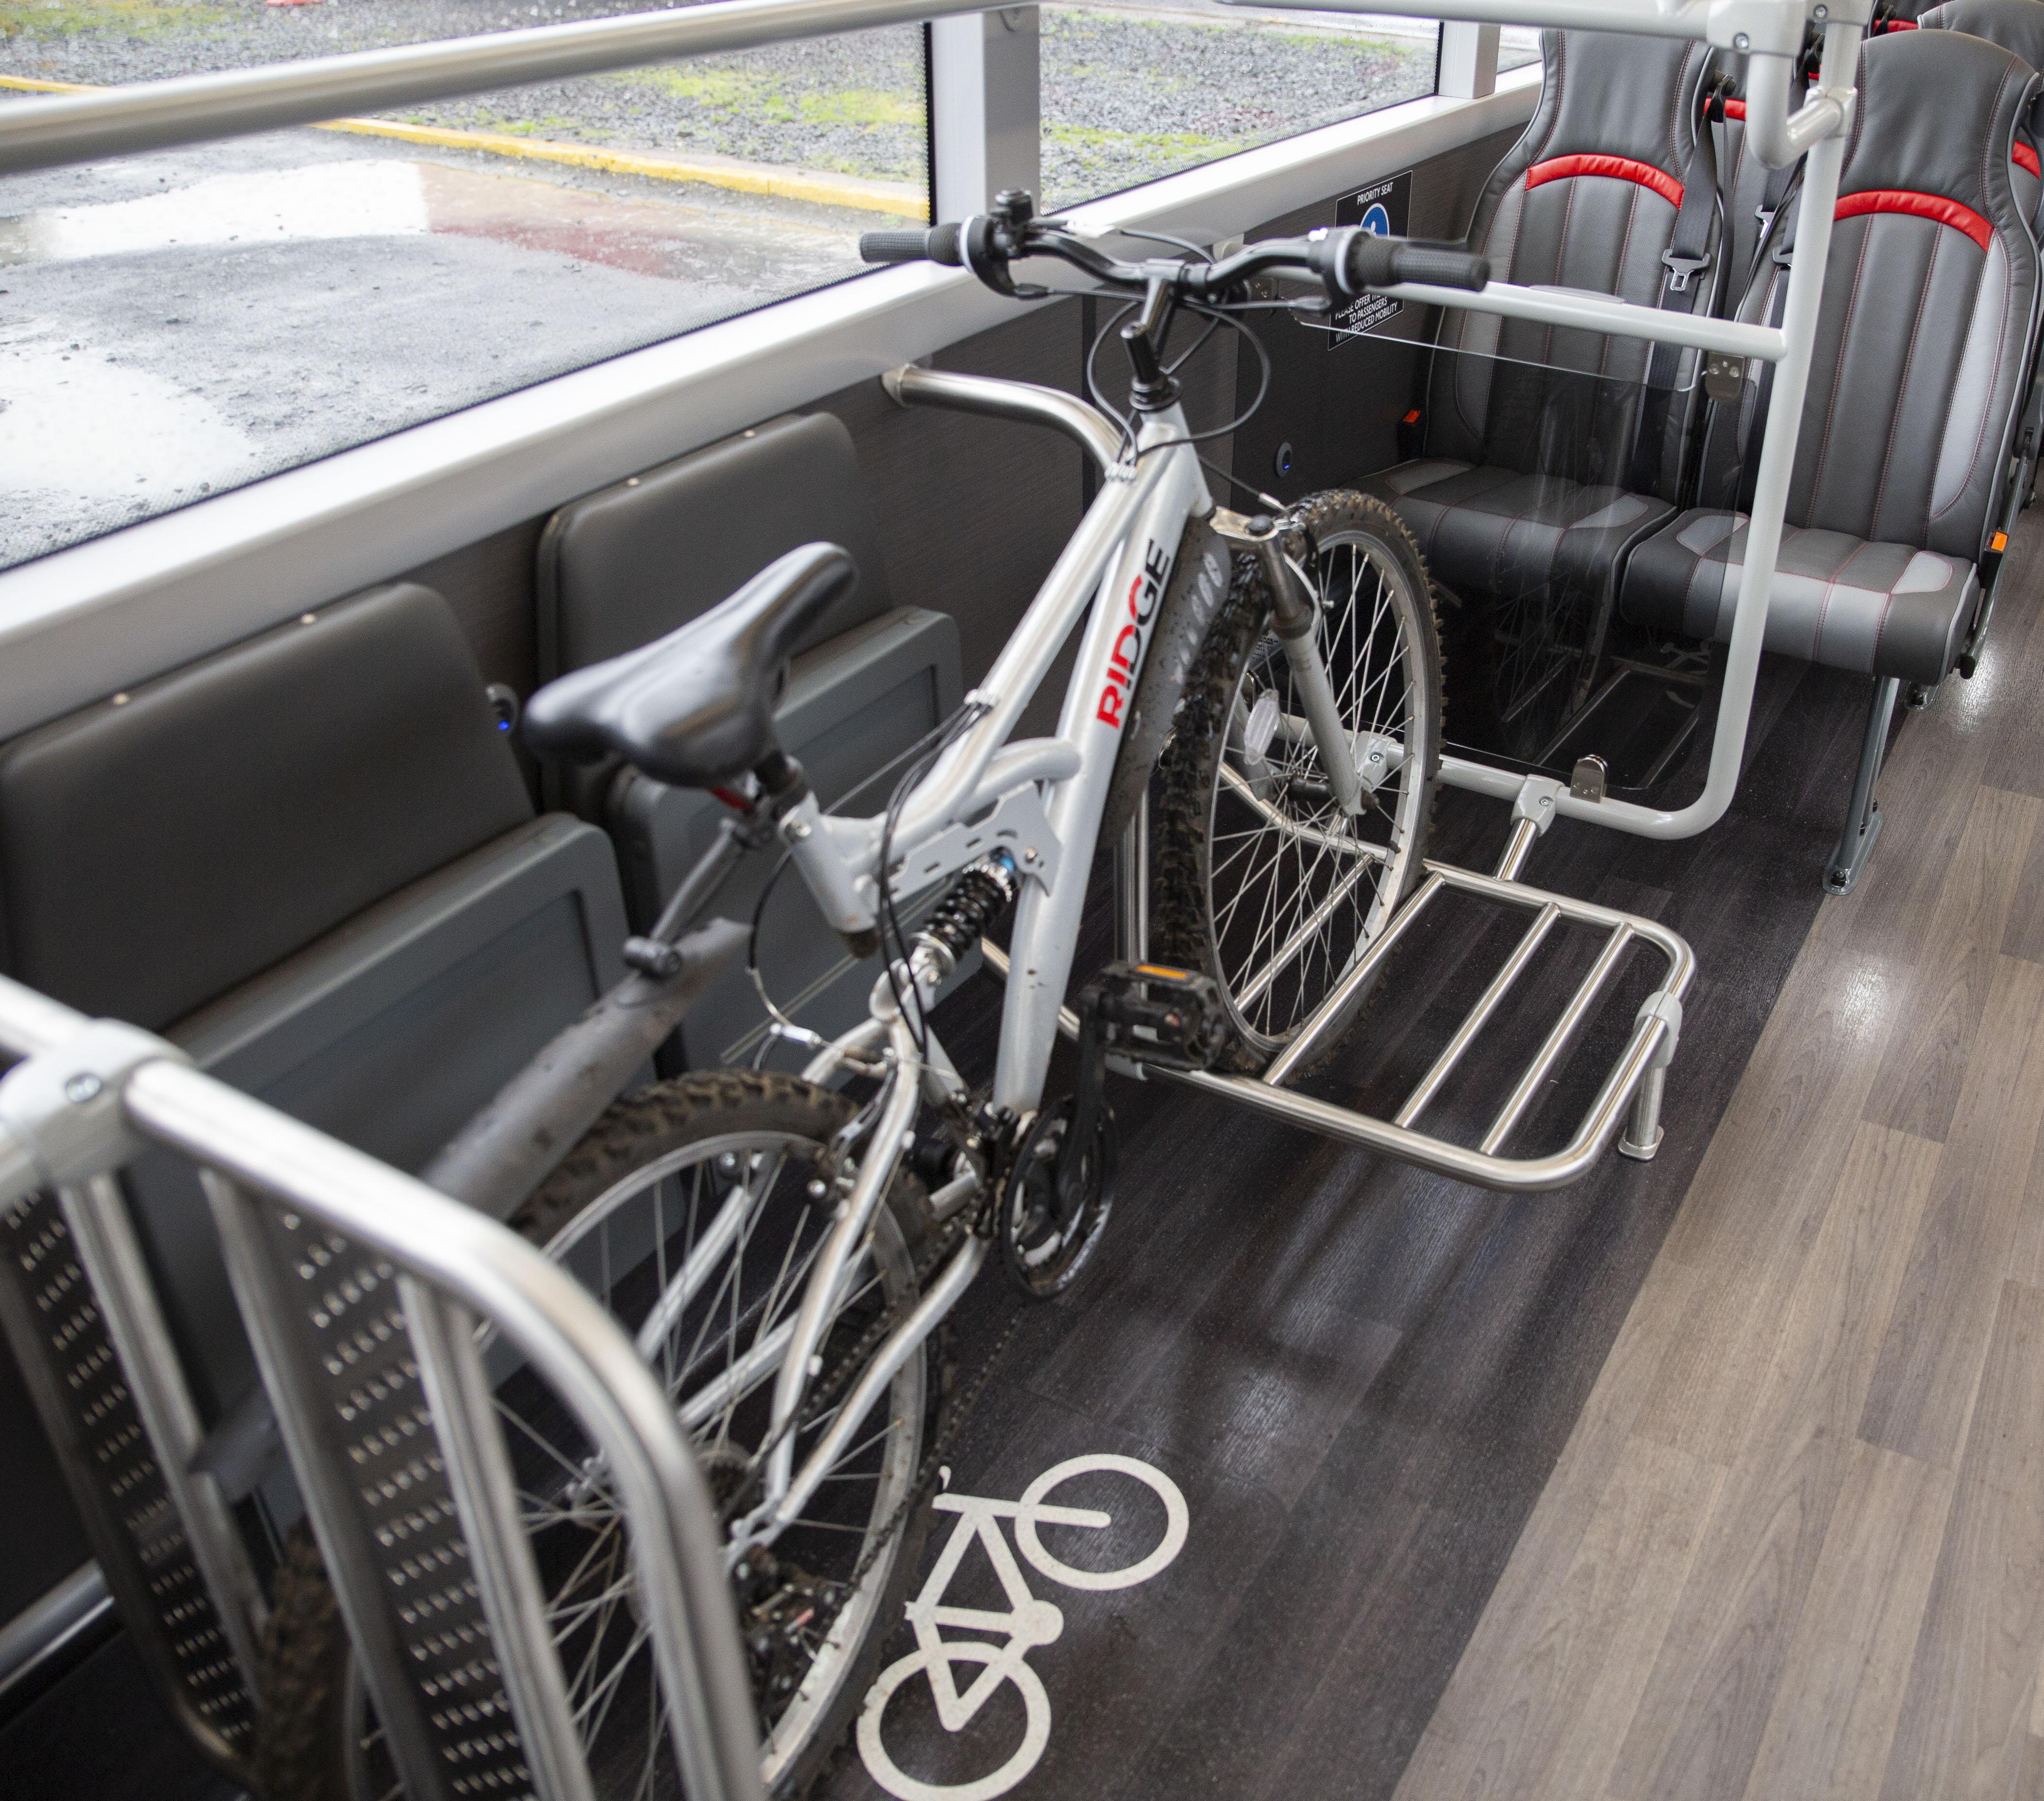 silver bike on bike rack on bus